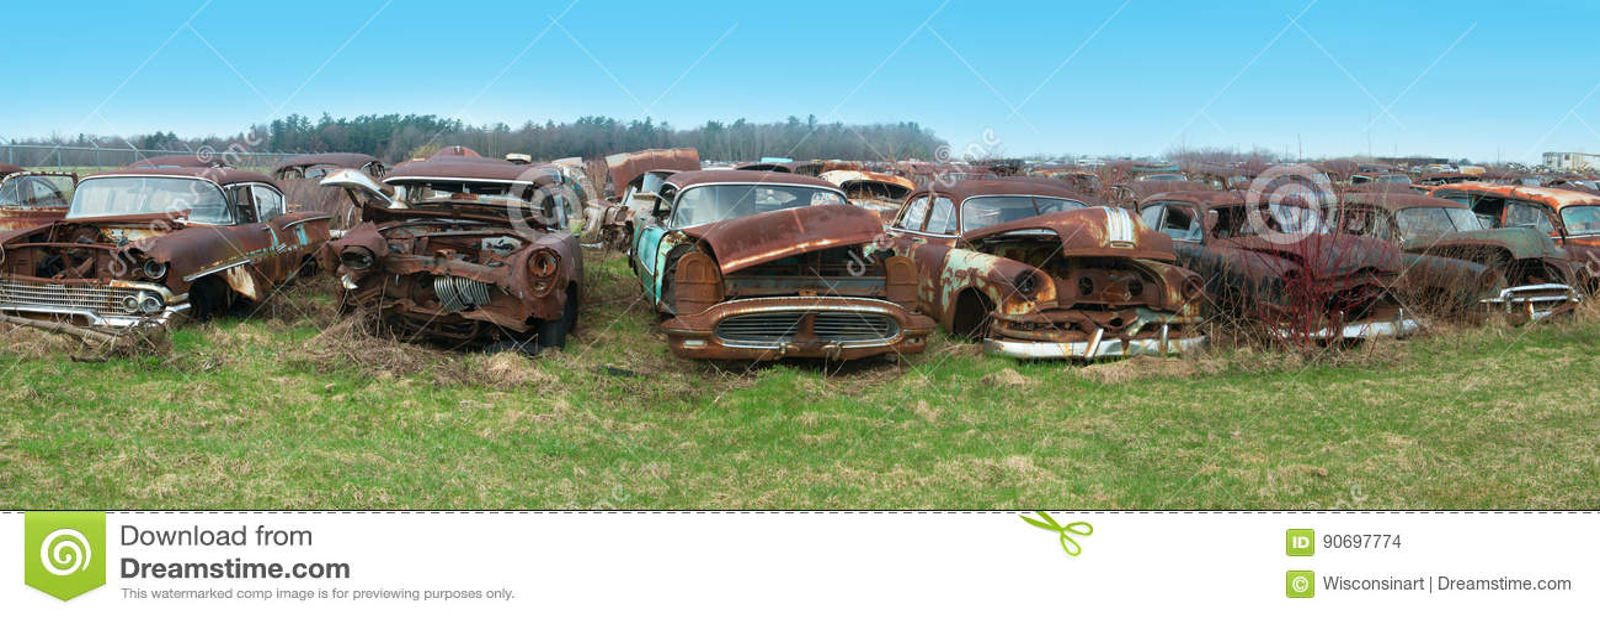 Old Classic Car, Cars, Junkyard Stock Photo - Image of rusty, retro ...